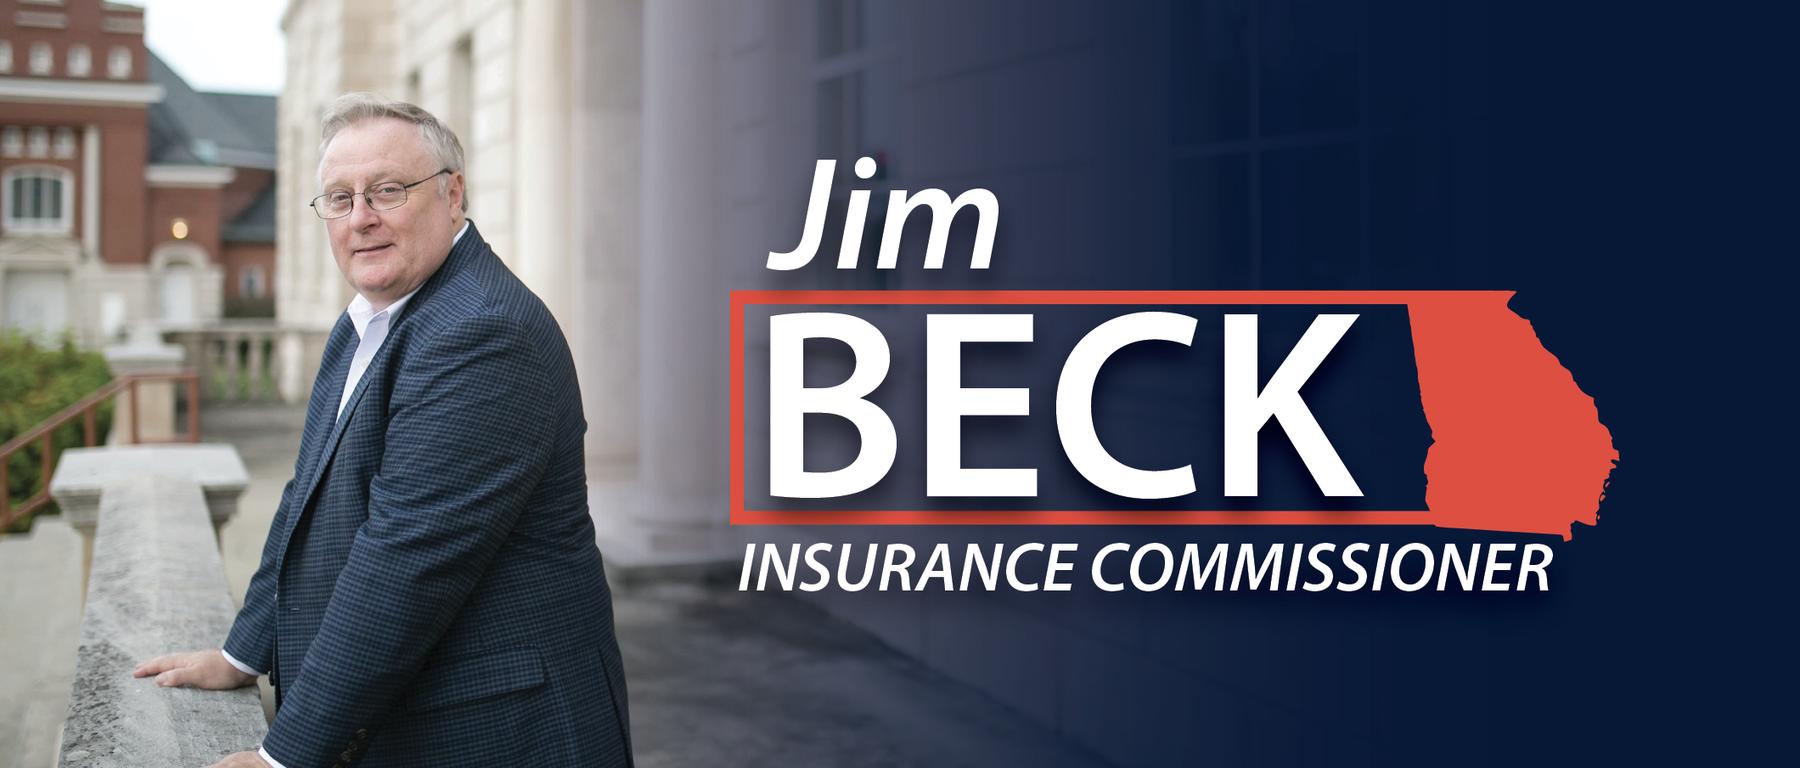 Jim_Beck.png